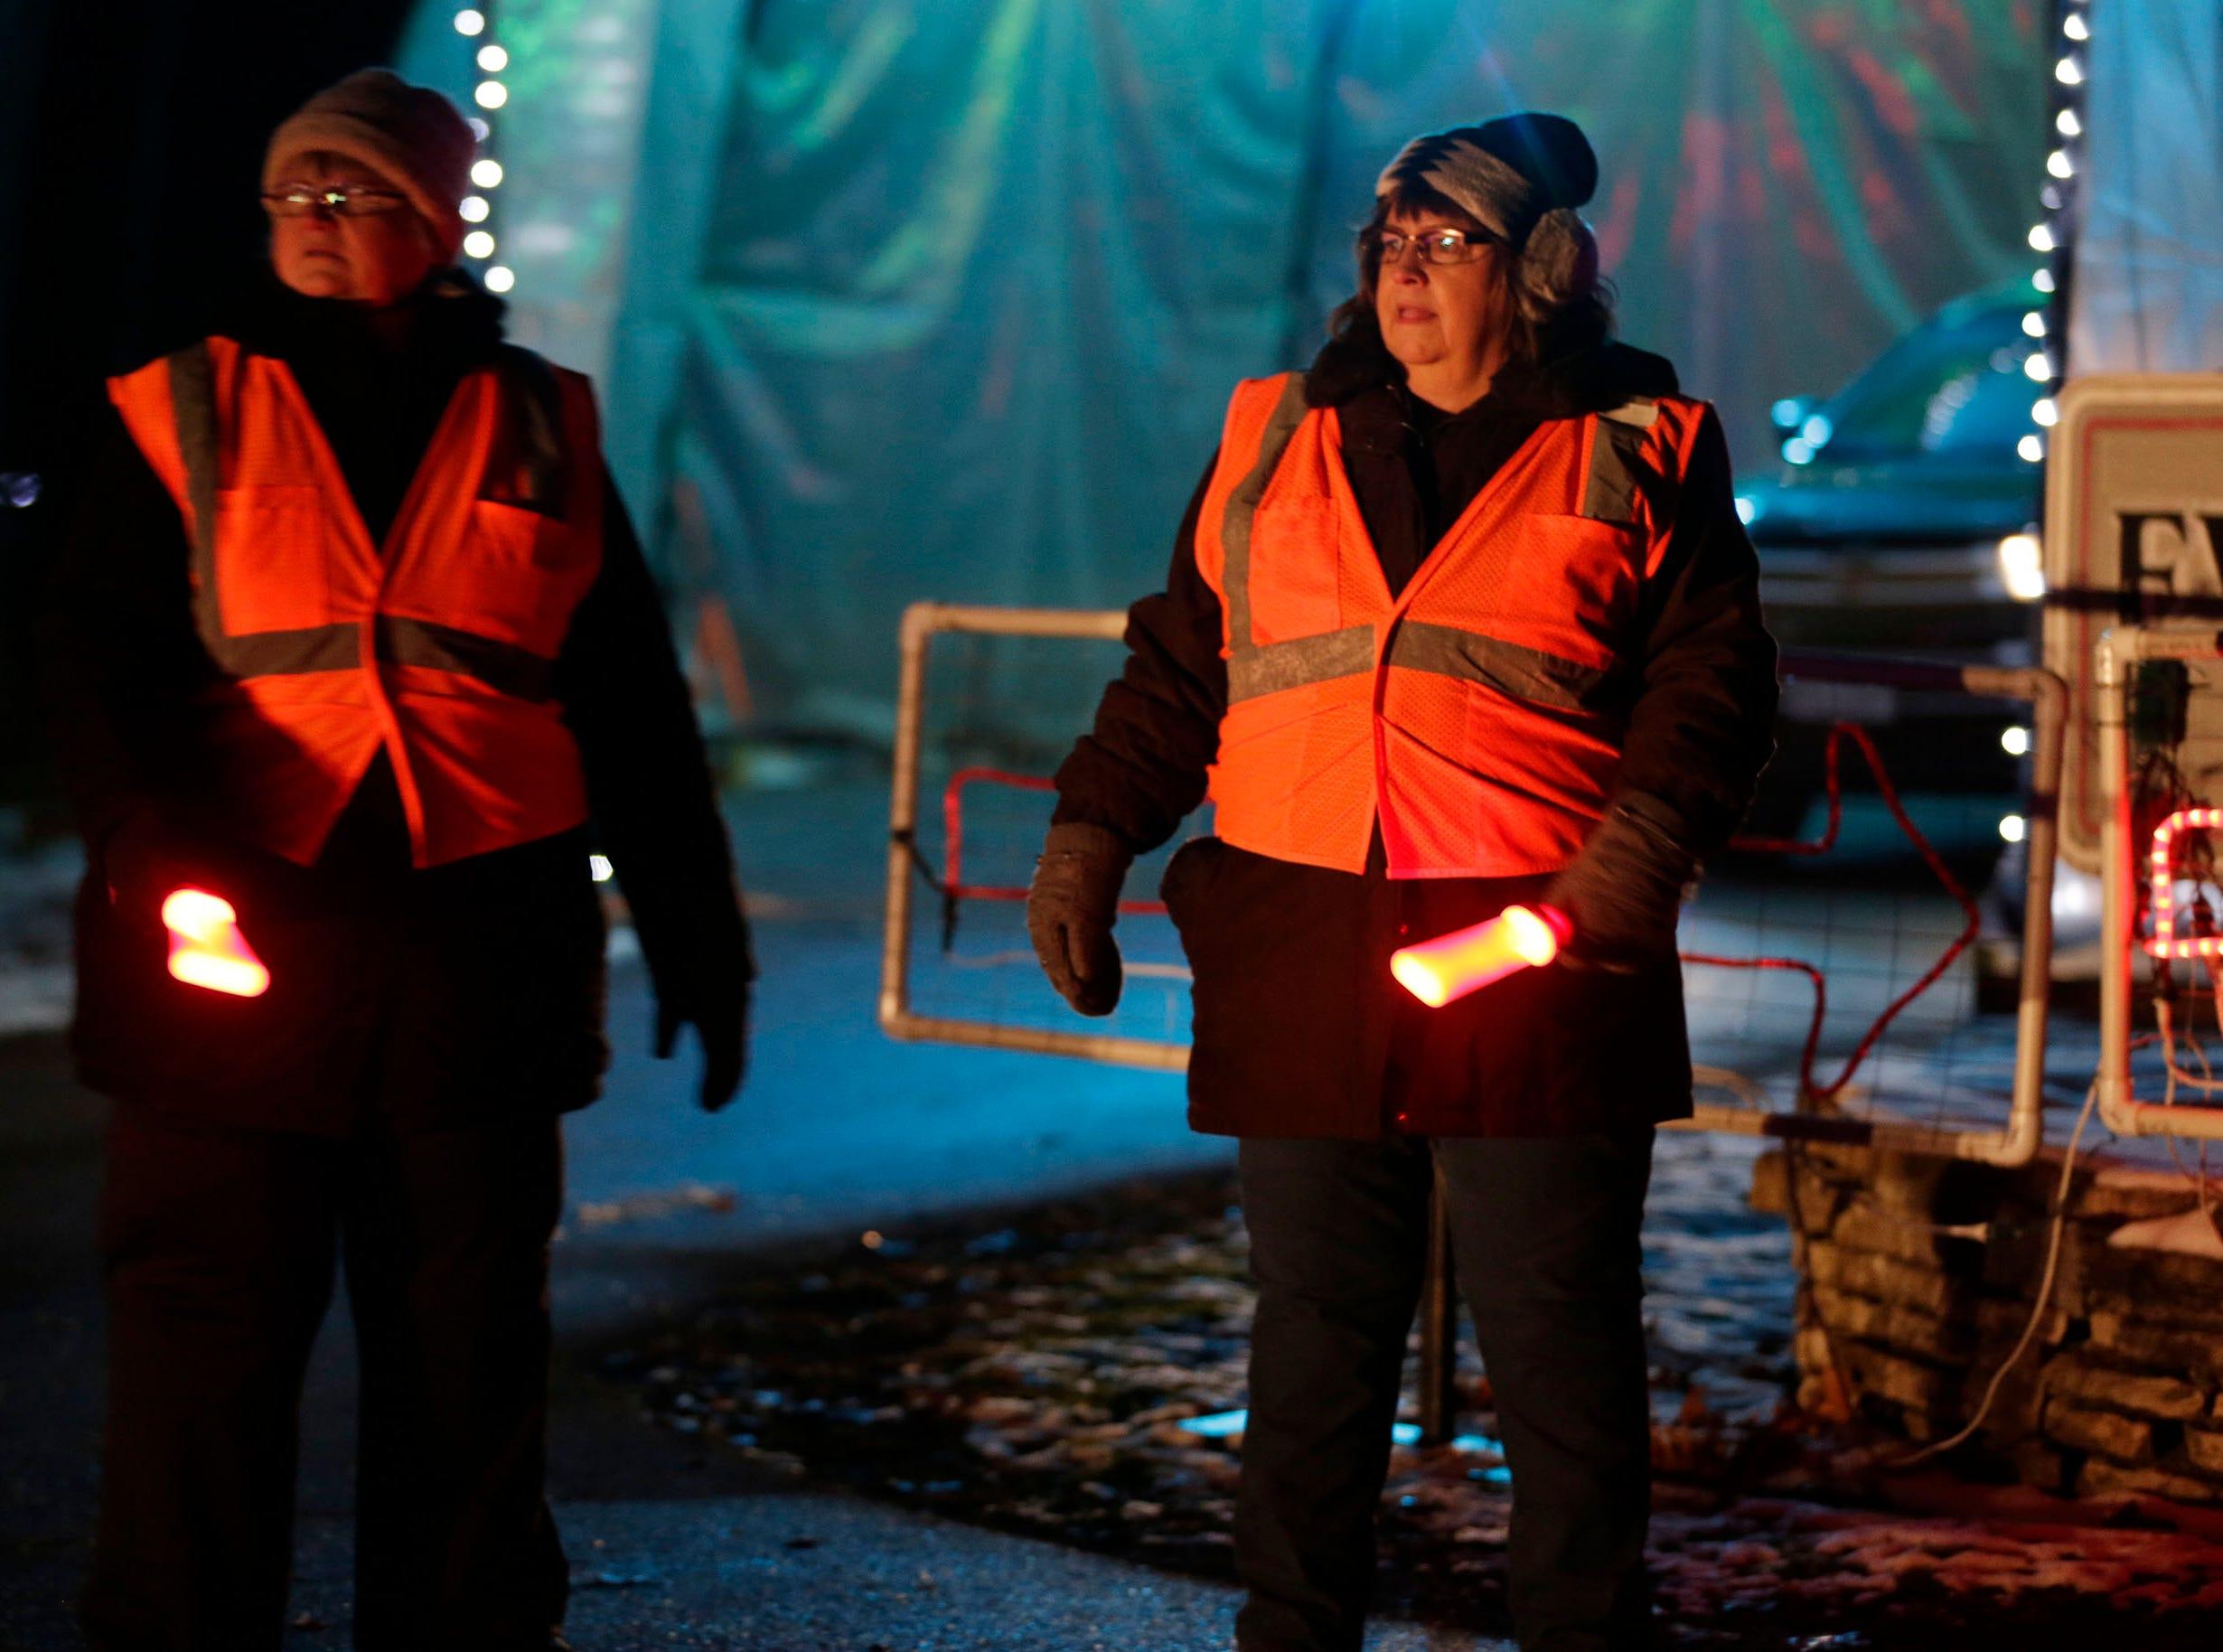 Luann Jenty, left, and Kathy Donlon, both of Sheboygan, help guide motorists at Making Spirits Bright at Evergreen Park, Friday, November 30, 2018, in Sheboygan, Wis.